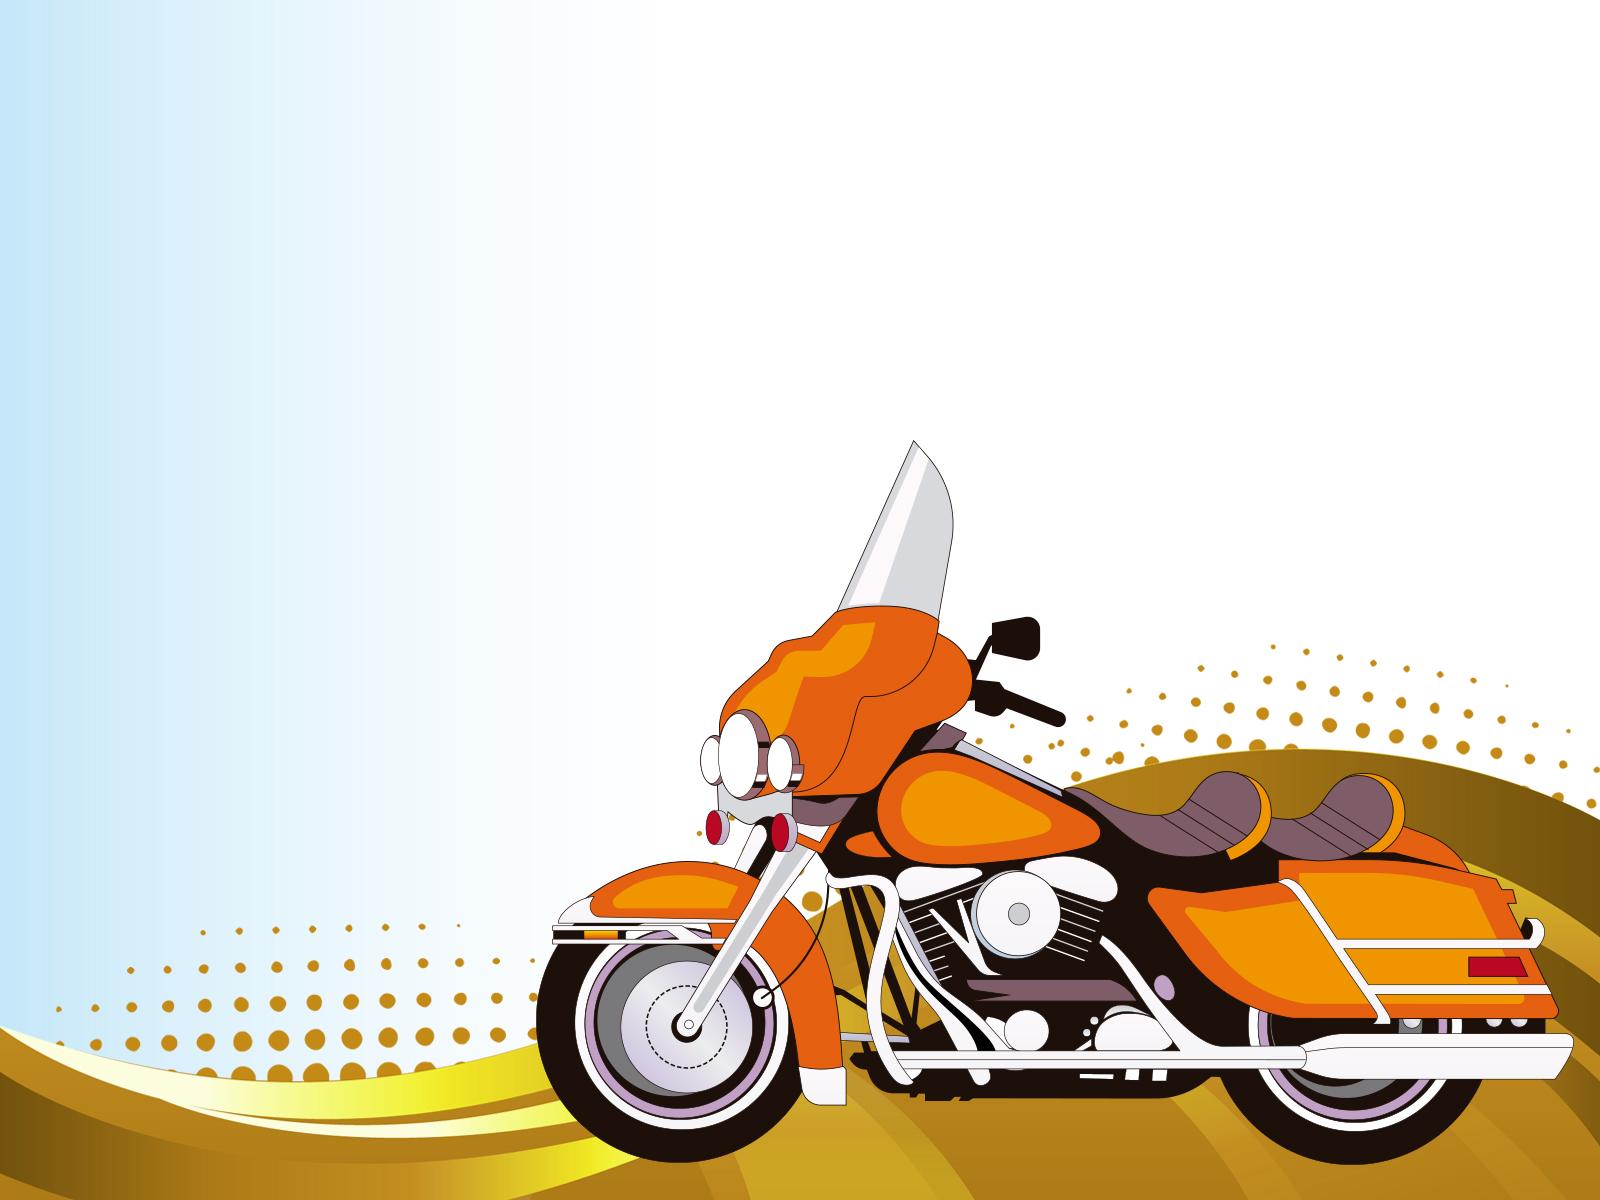 Yamaha clipart motorcycle Templates Motorcycle Yamaha Car Templates